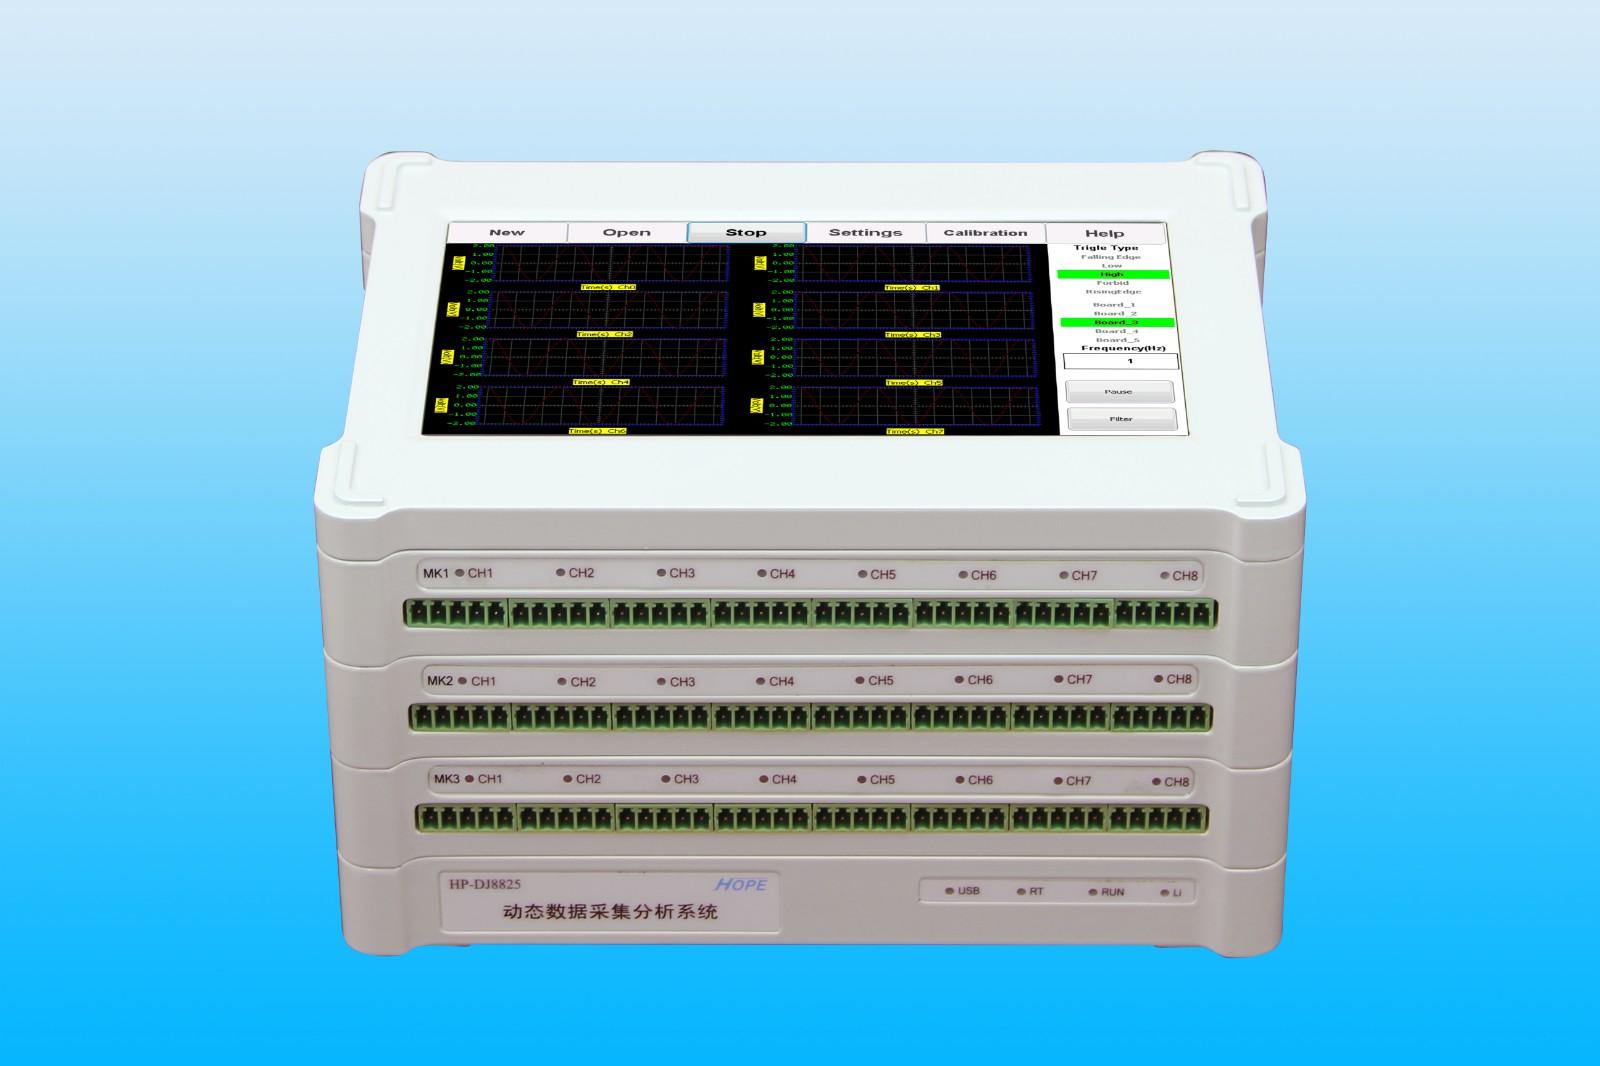 HP-DJ8325M 动态信号测试分析系统